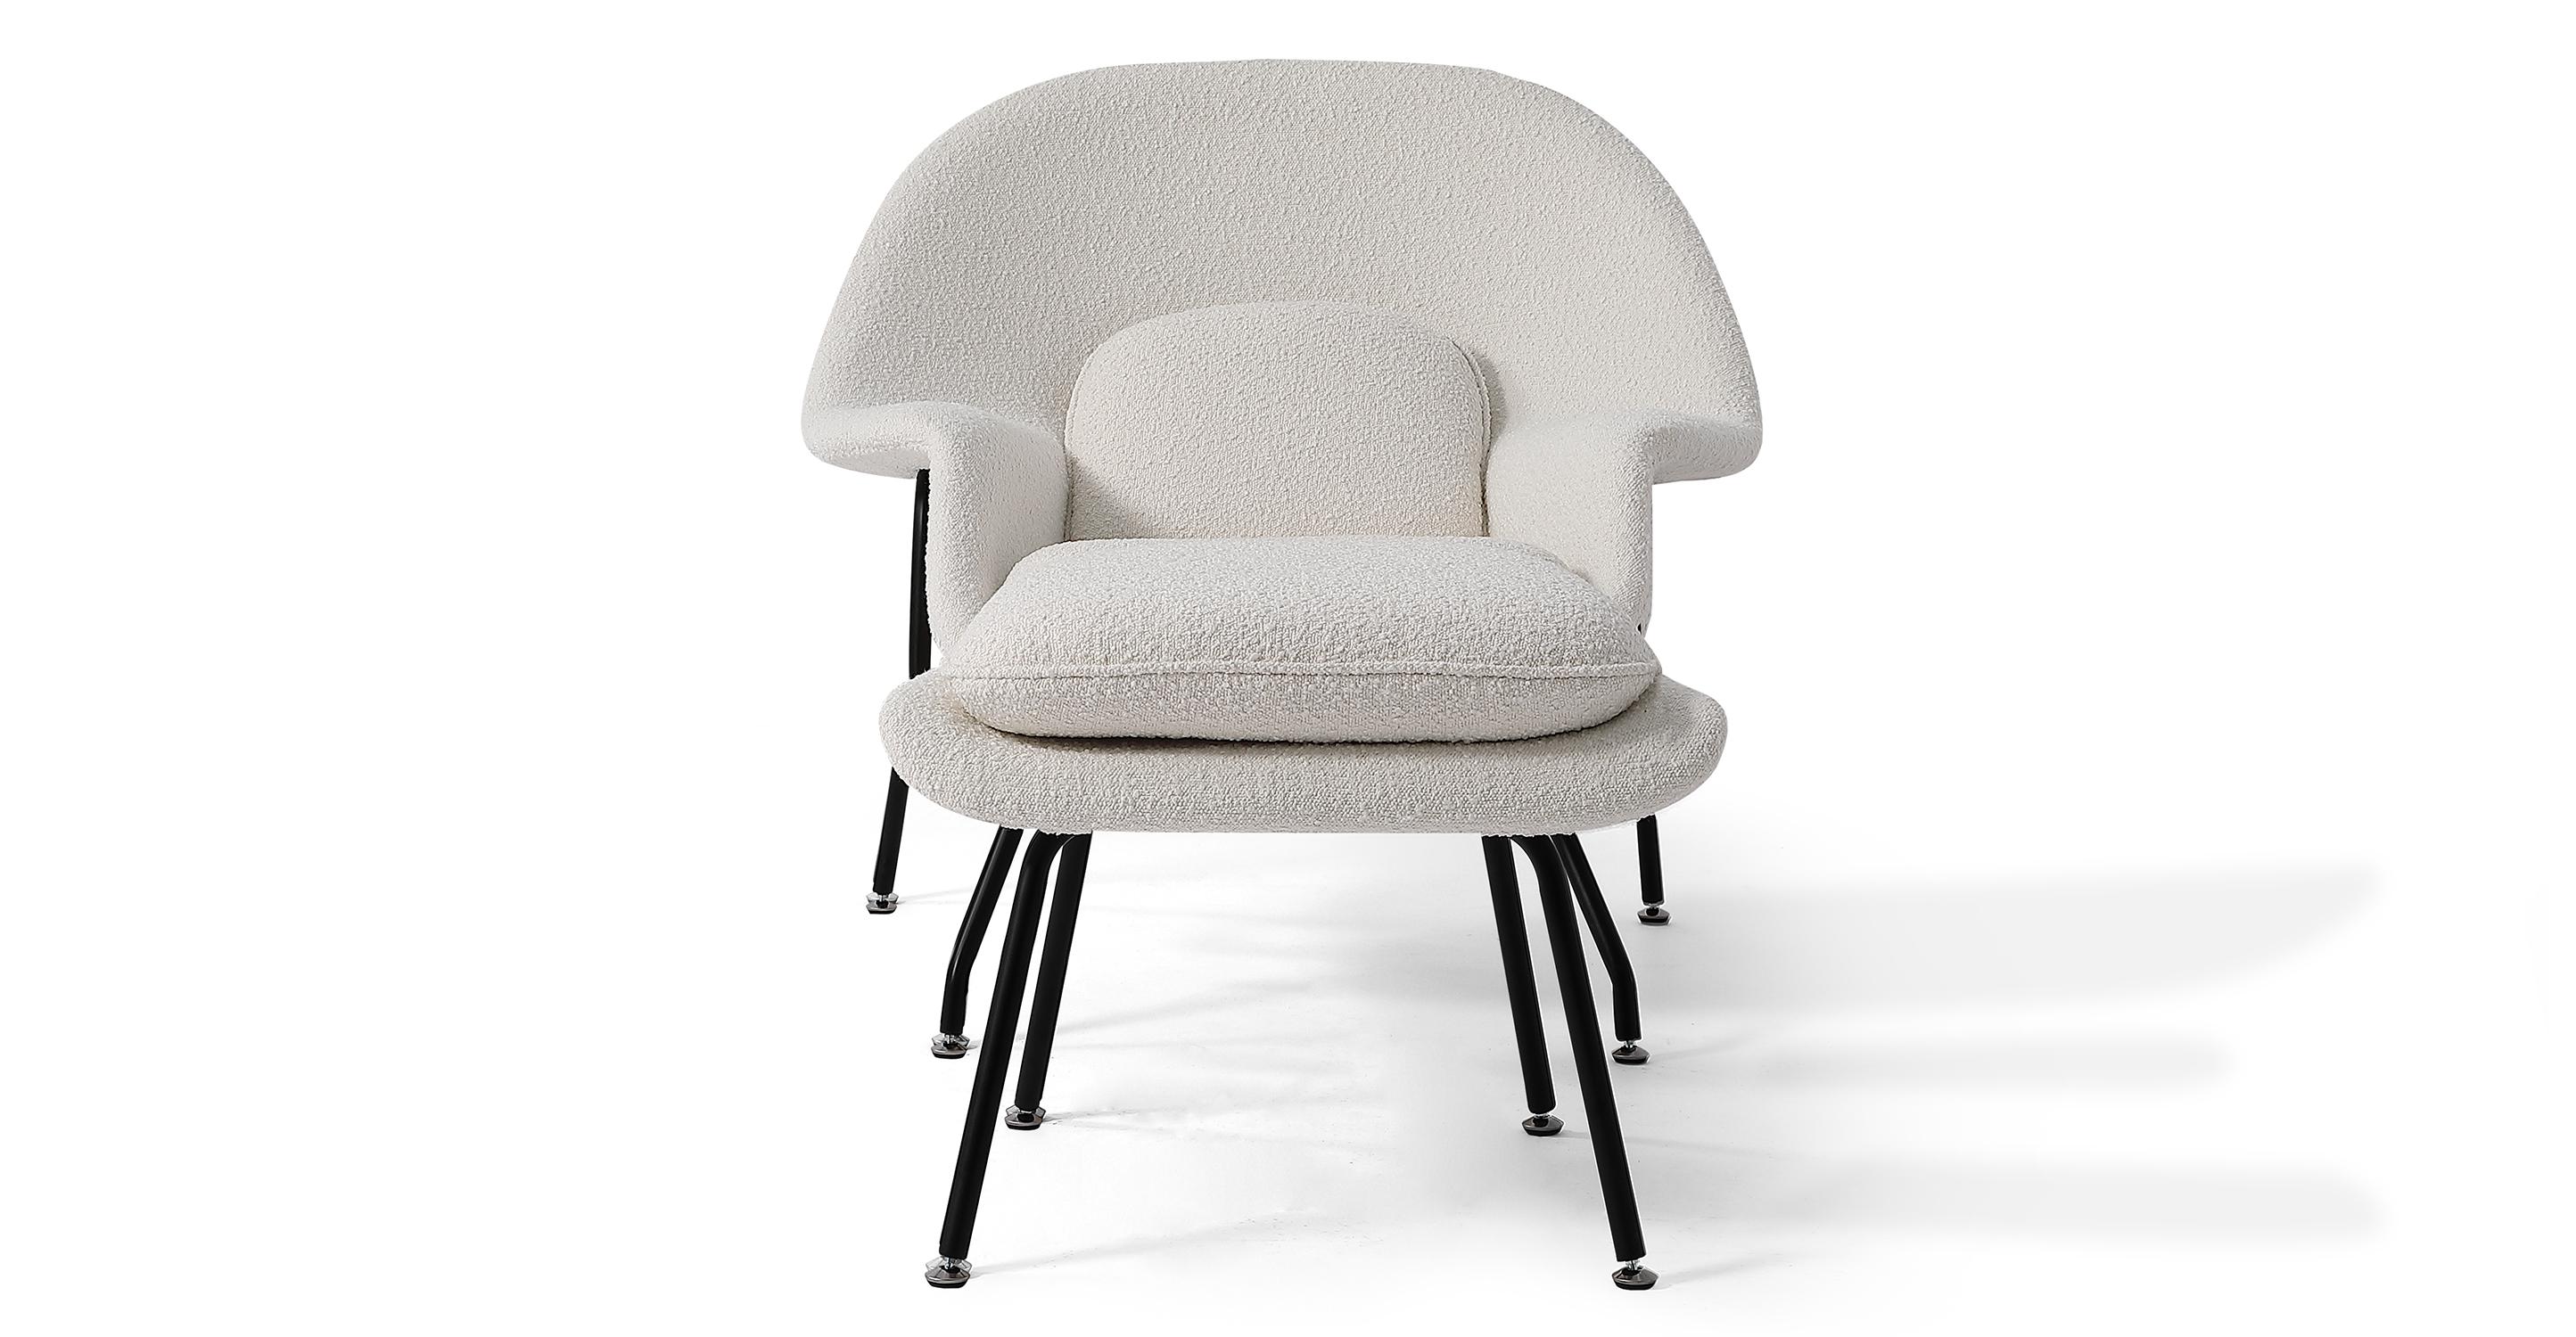 Womb Fabric Chair & Ottoman, Blanc Boucle